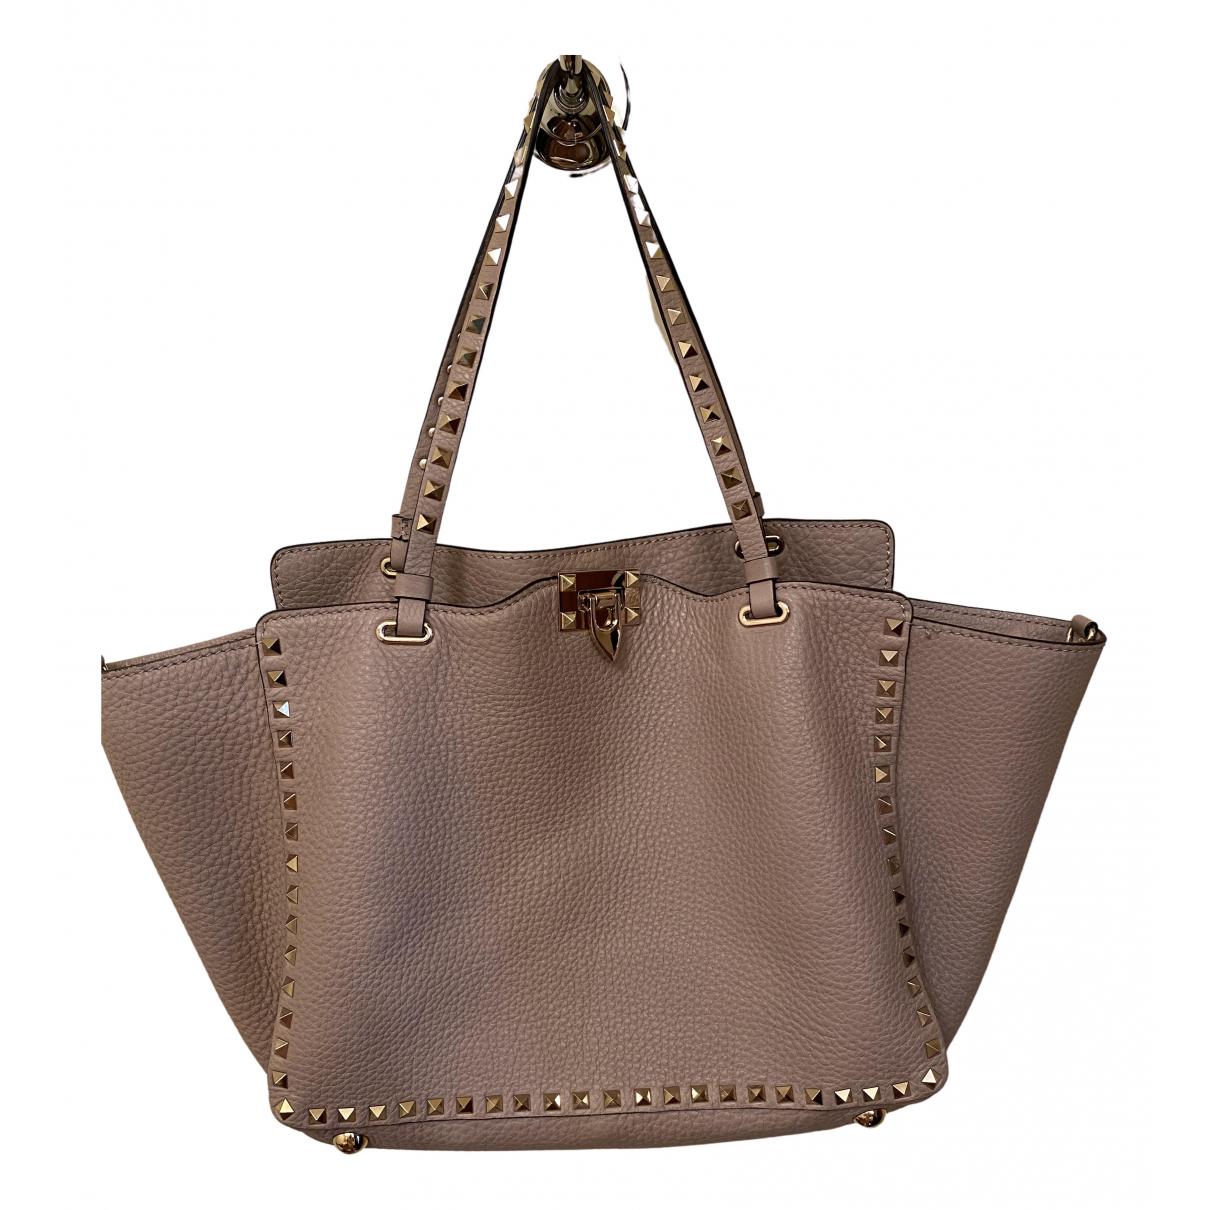 Valentino Garavani Rockstud Pink Leather handbag for Women \N